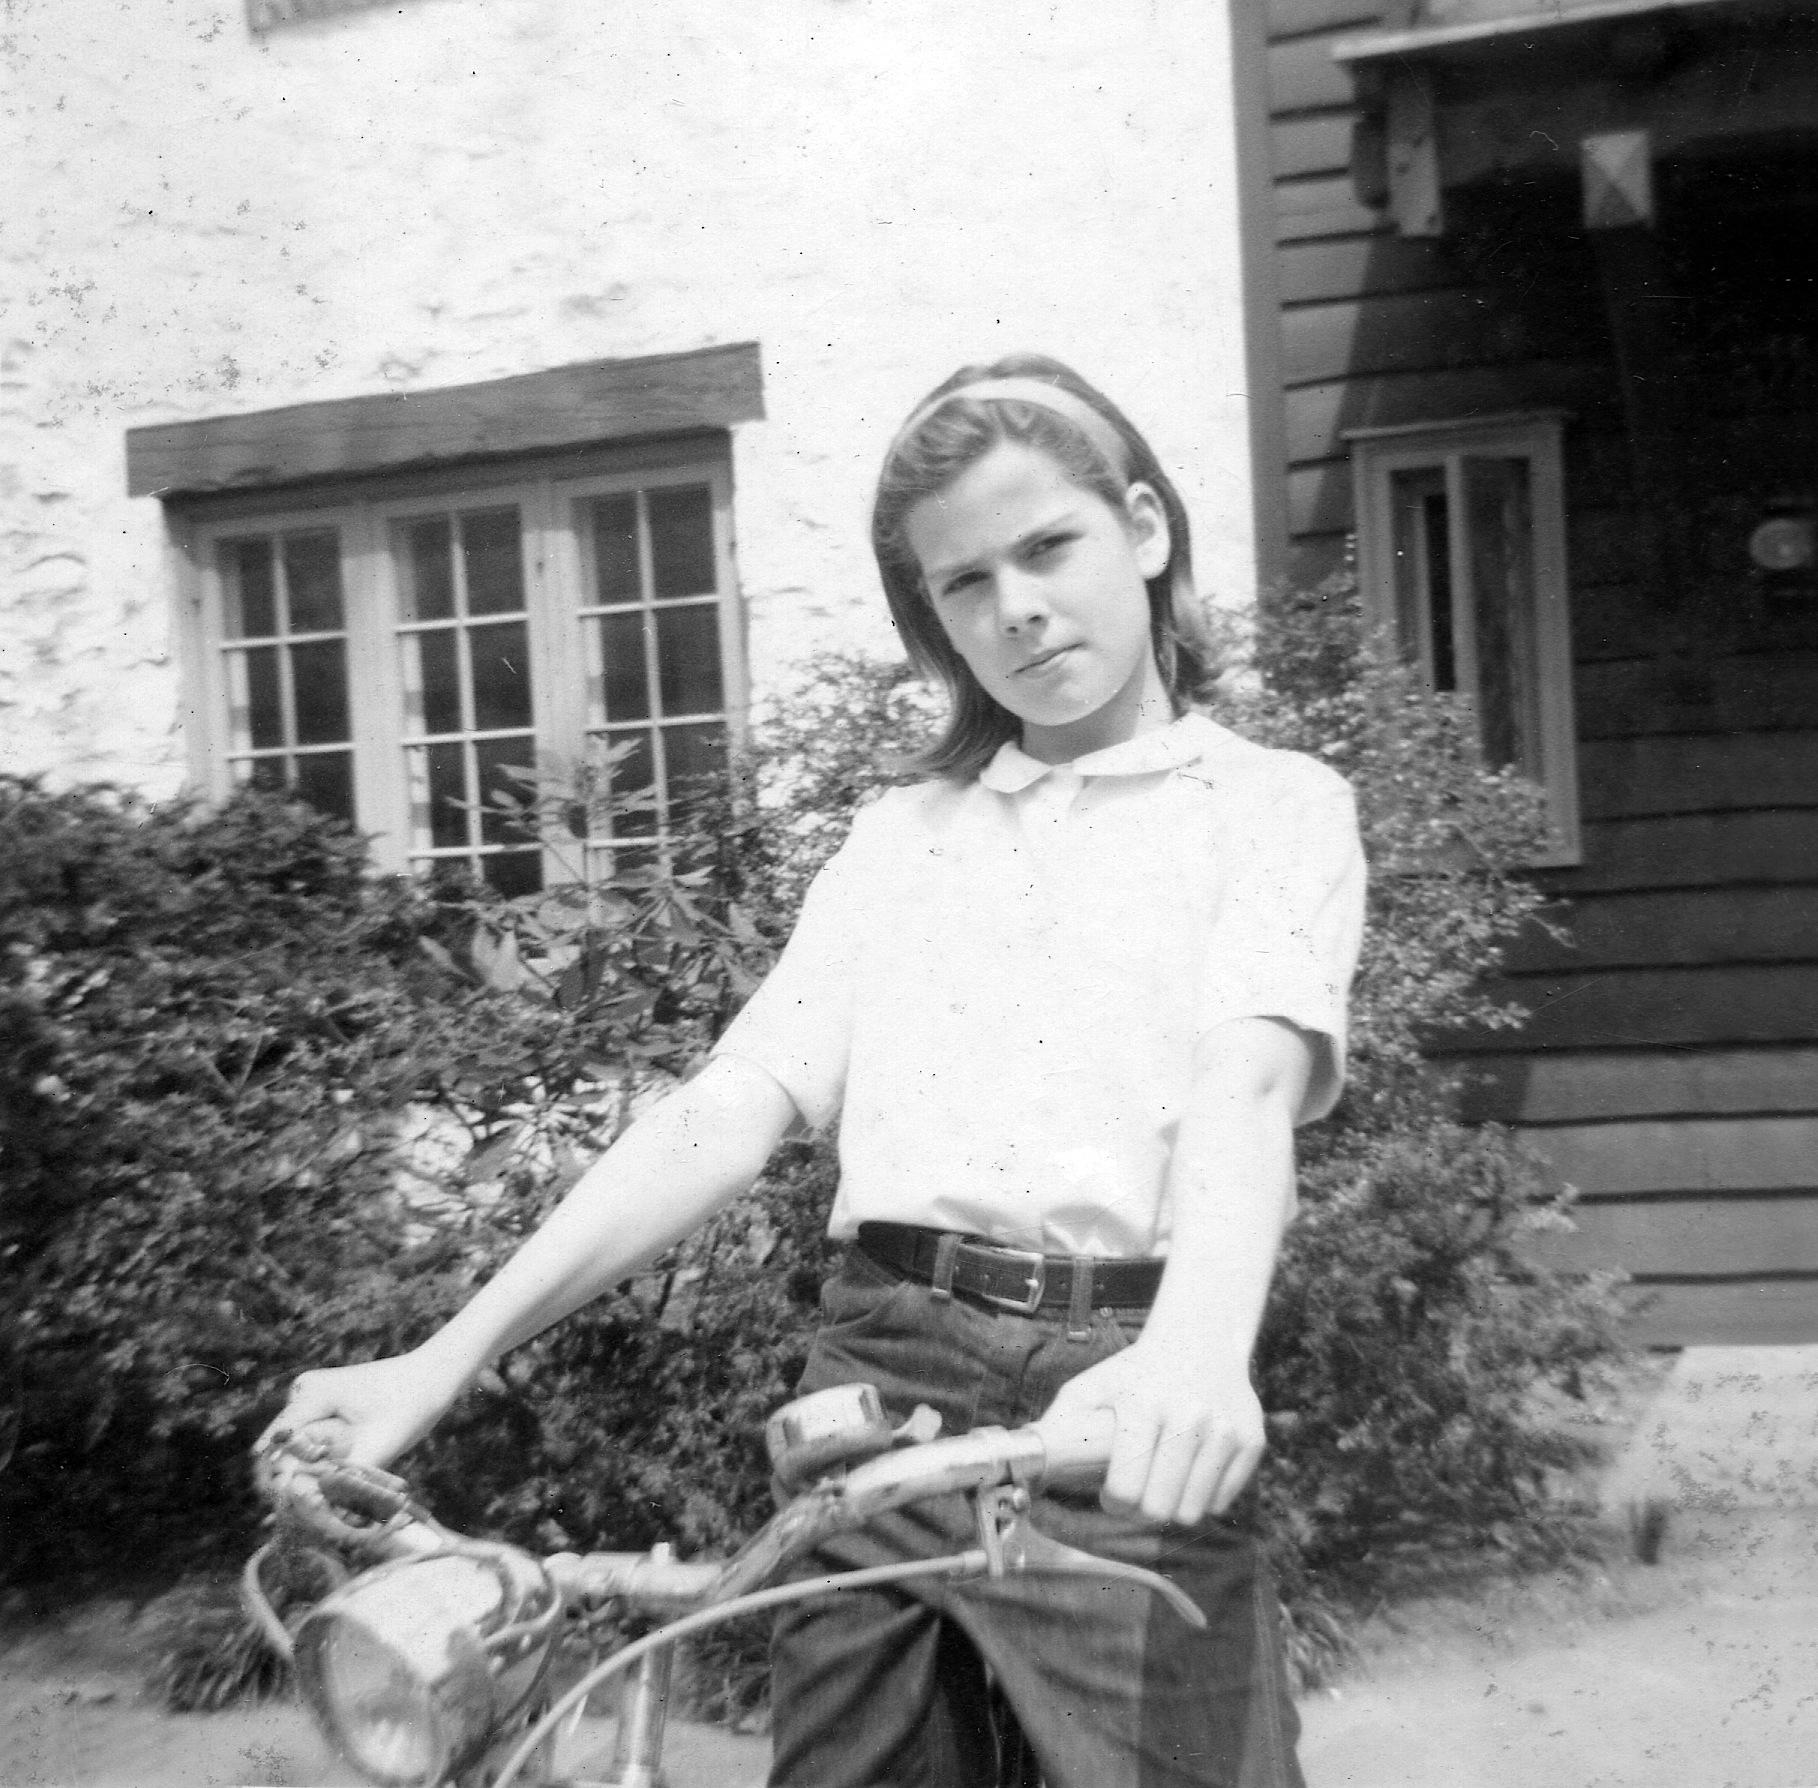 Anne on bicyle